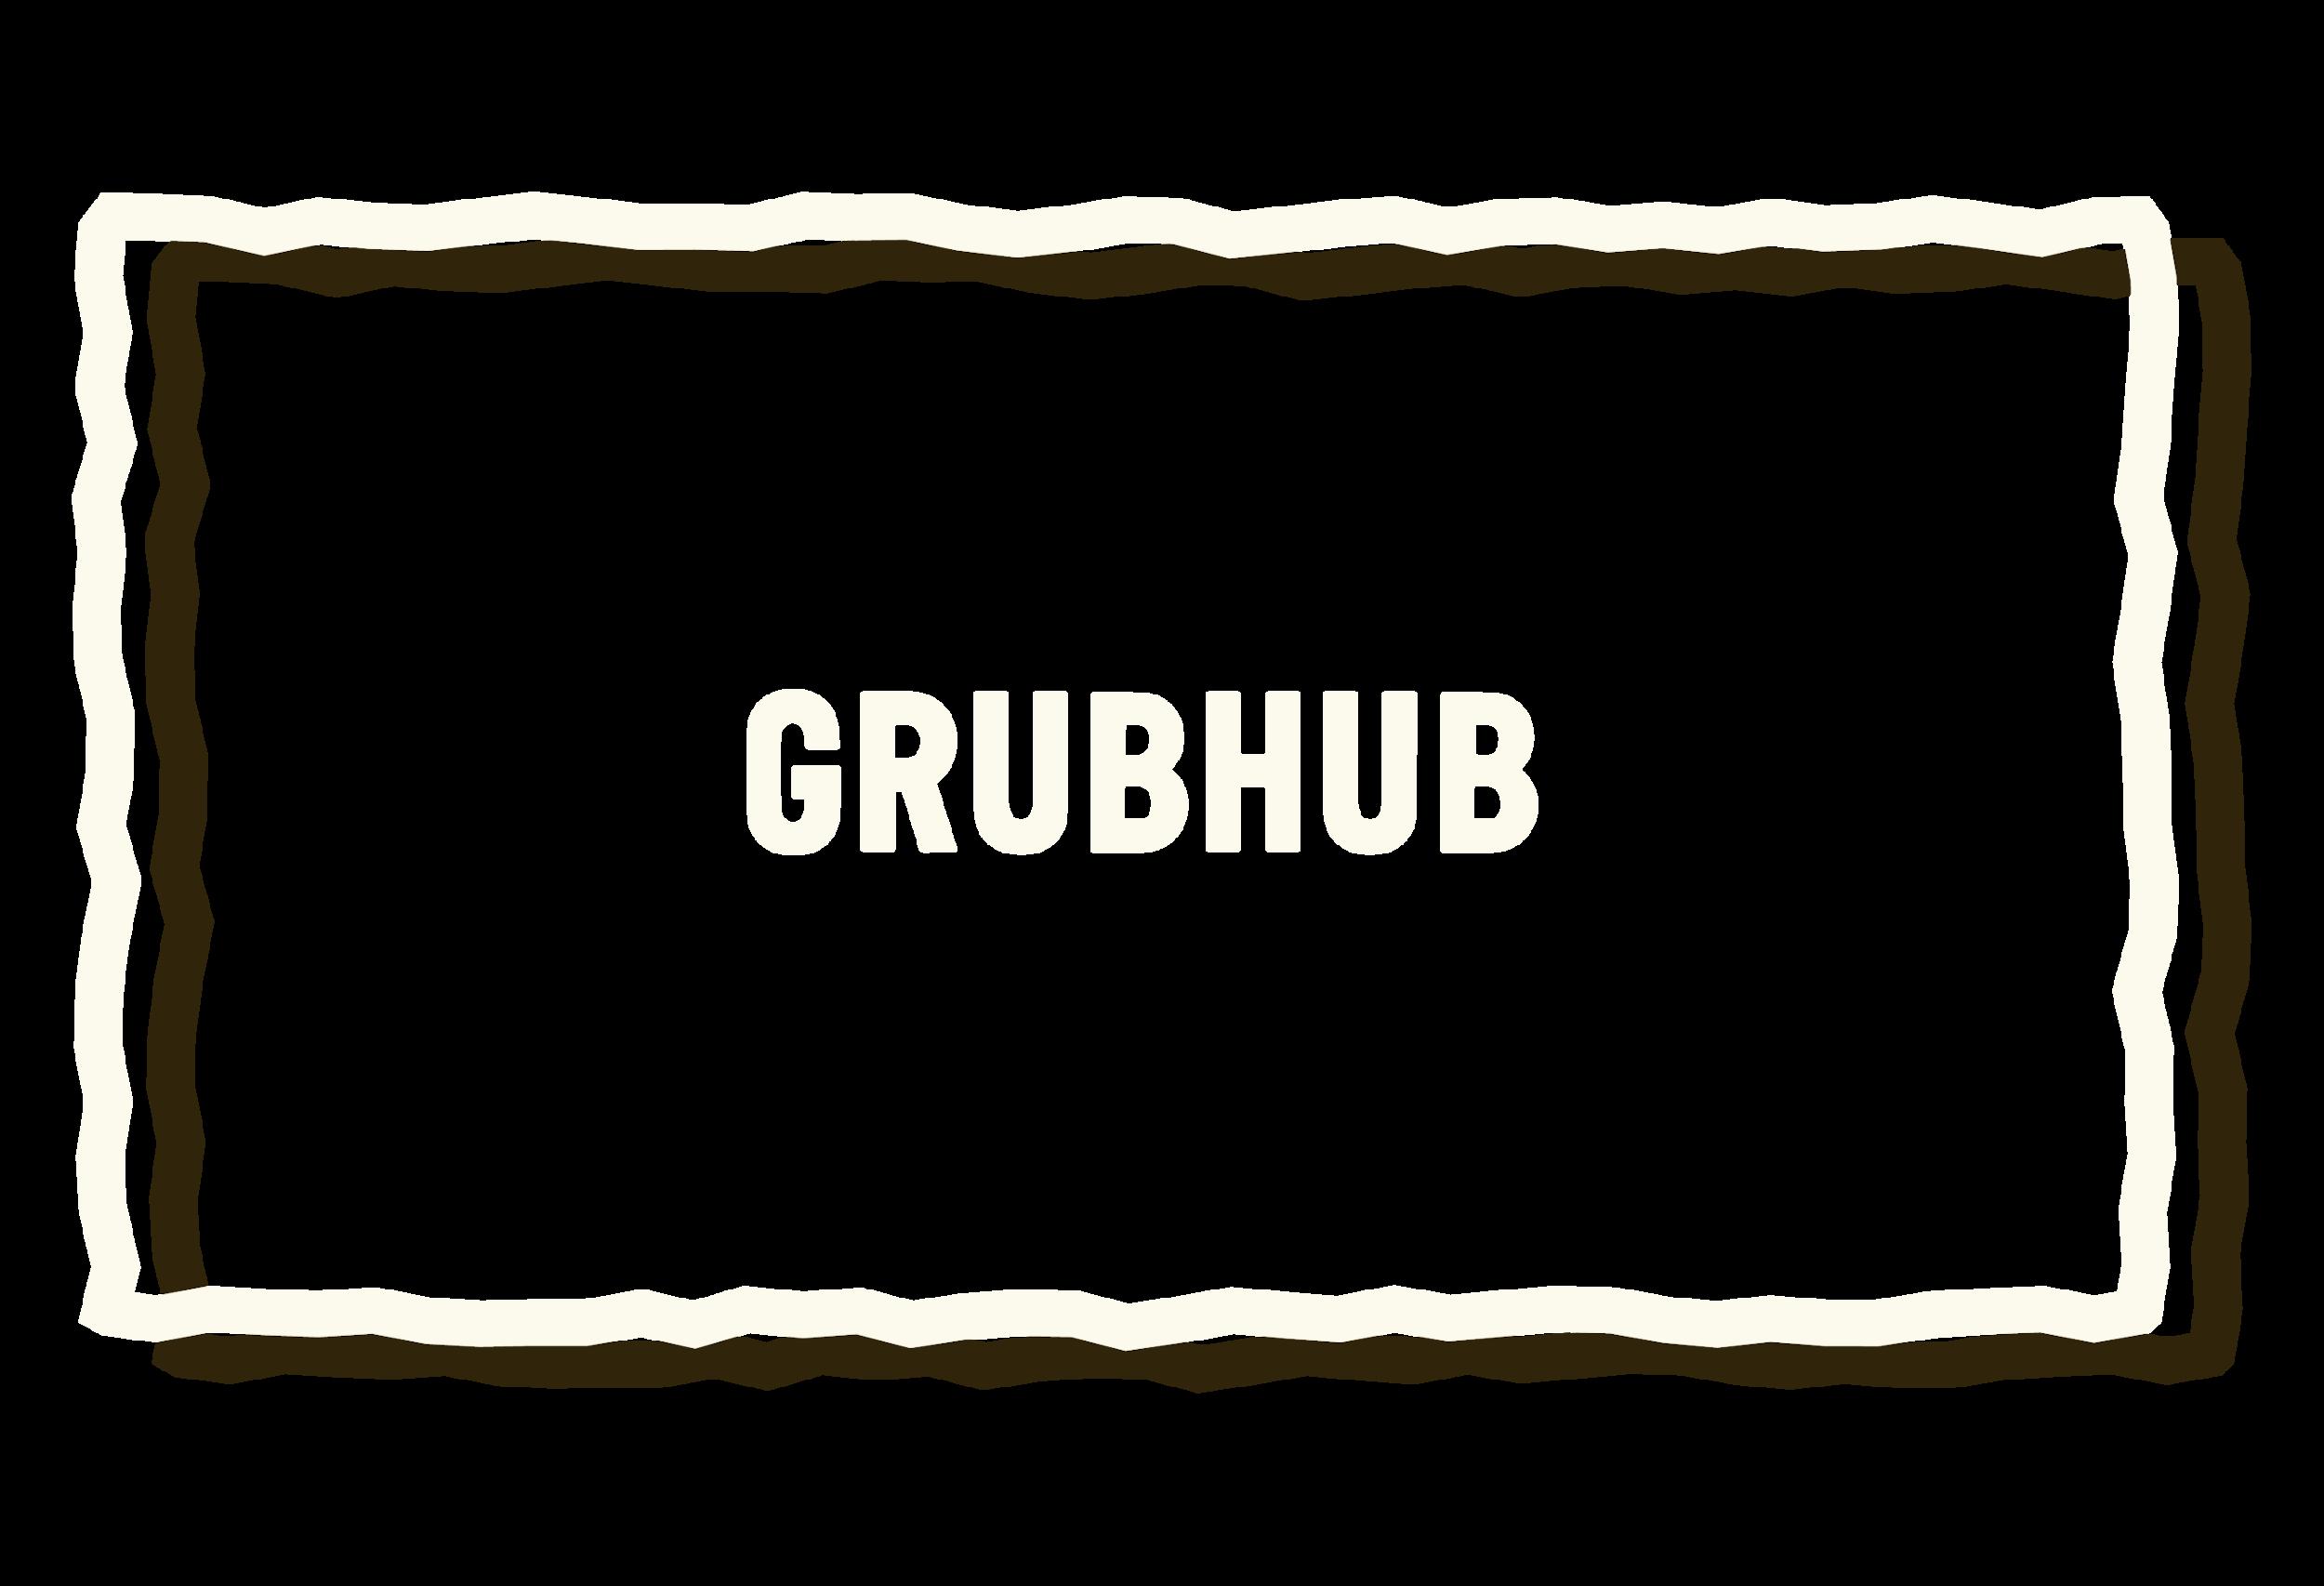 grubhub rotombo logo order now